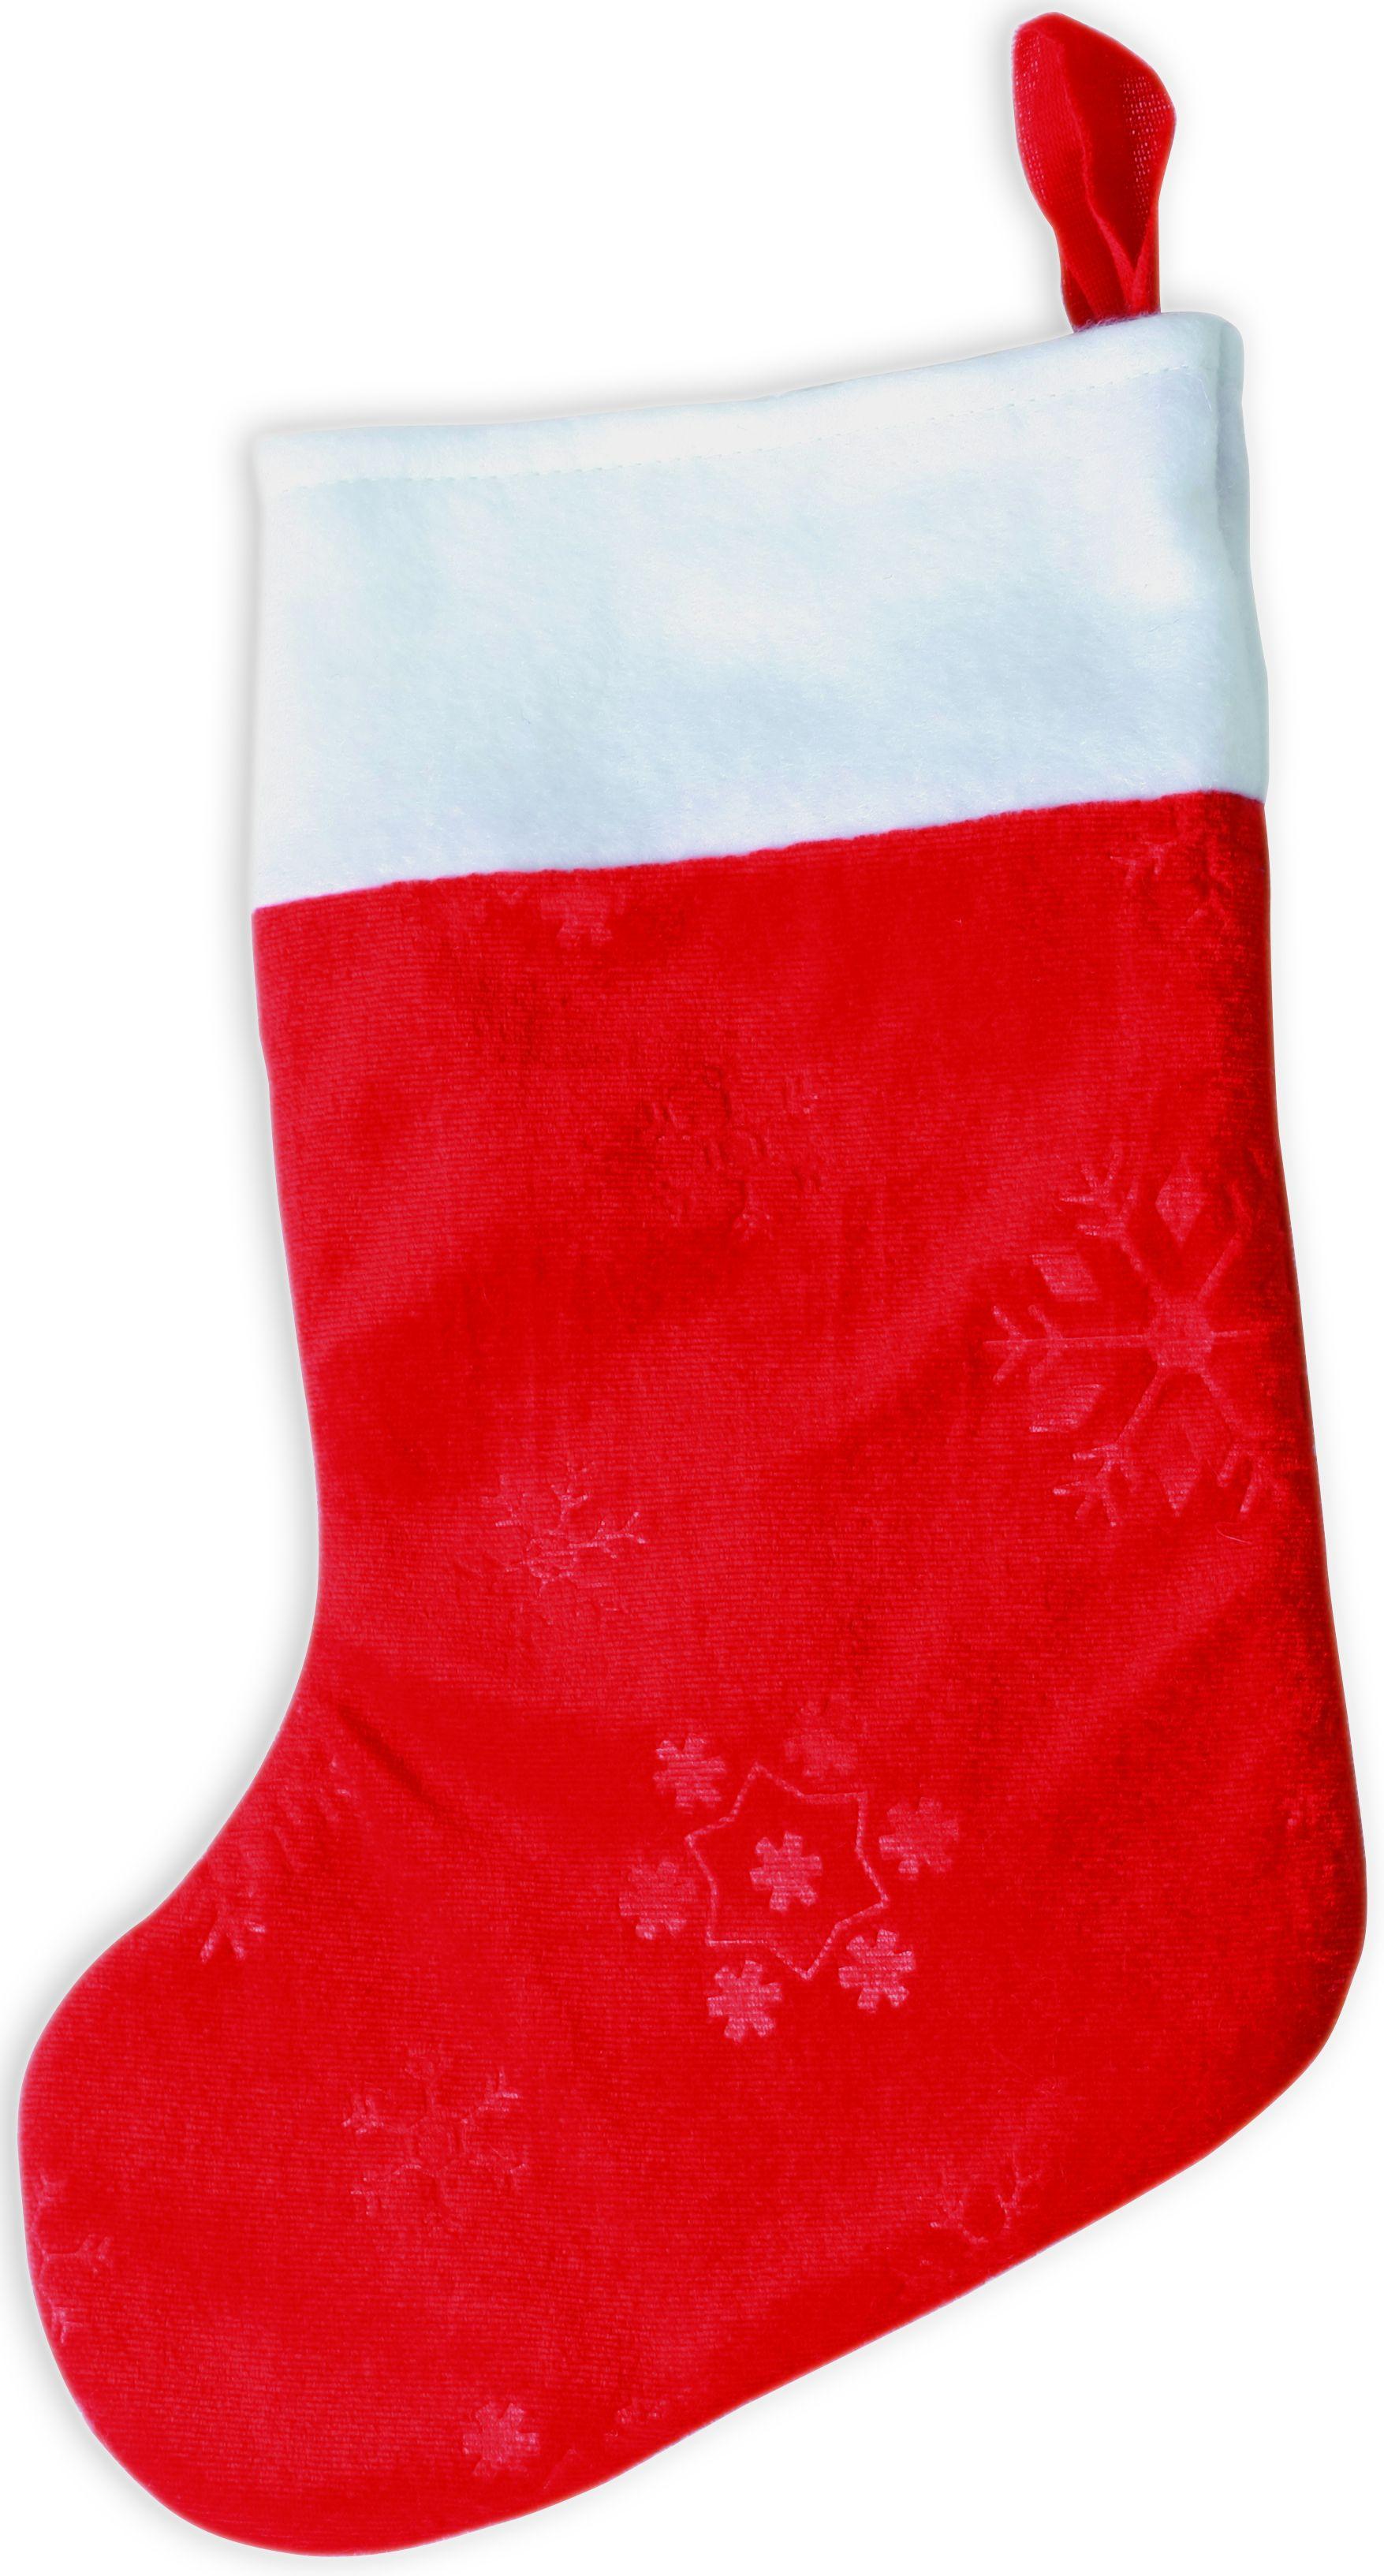 Socke Nikolaus Weihnachten Xmas Socken Myrtle Beach NEU | eBay